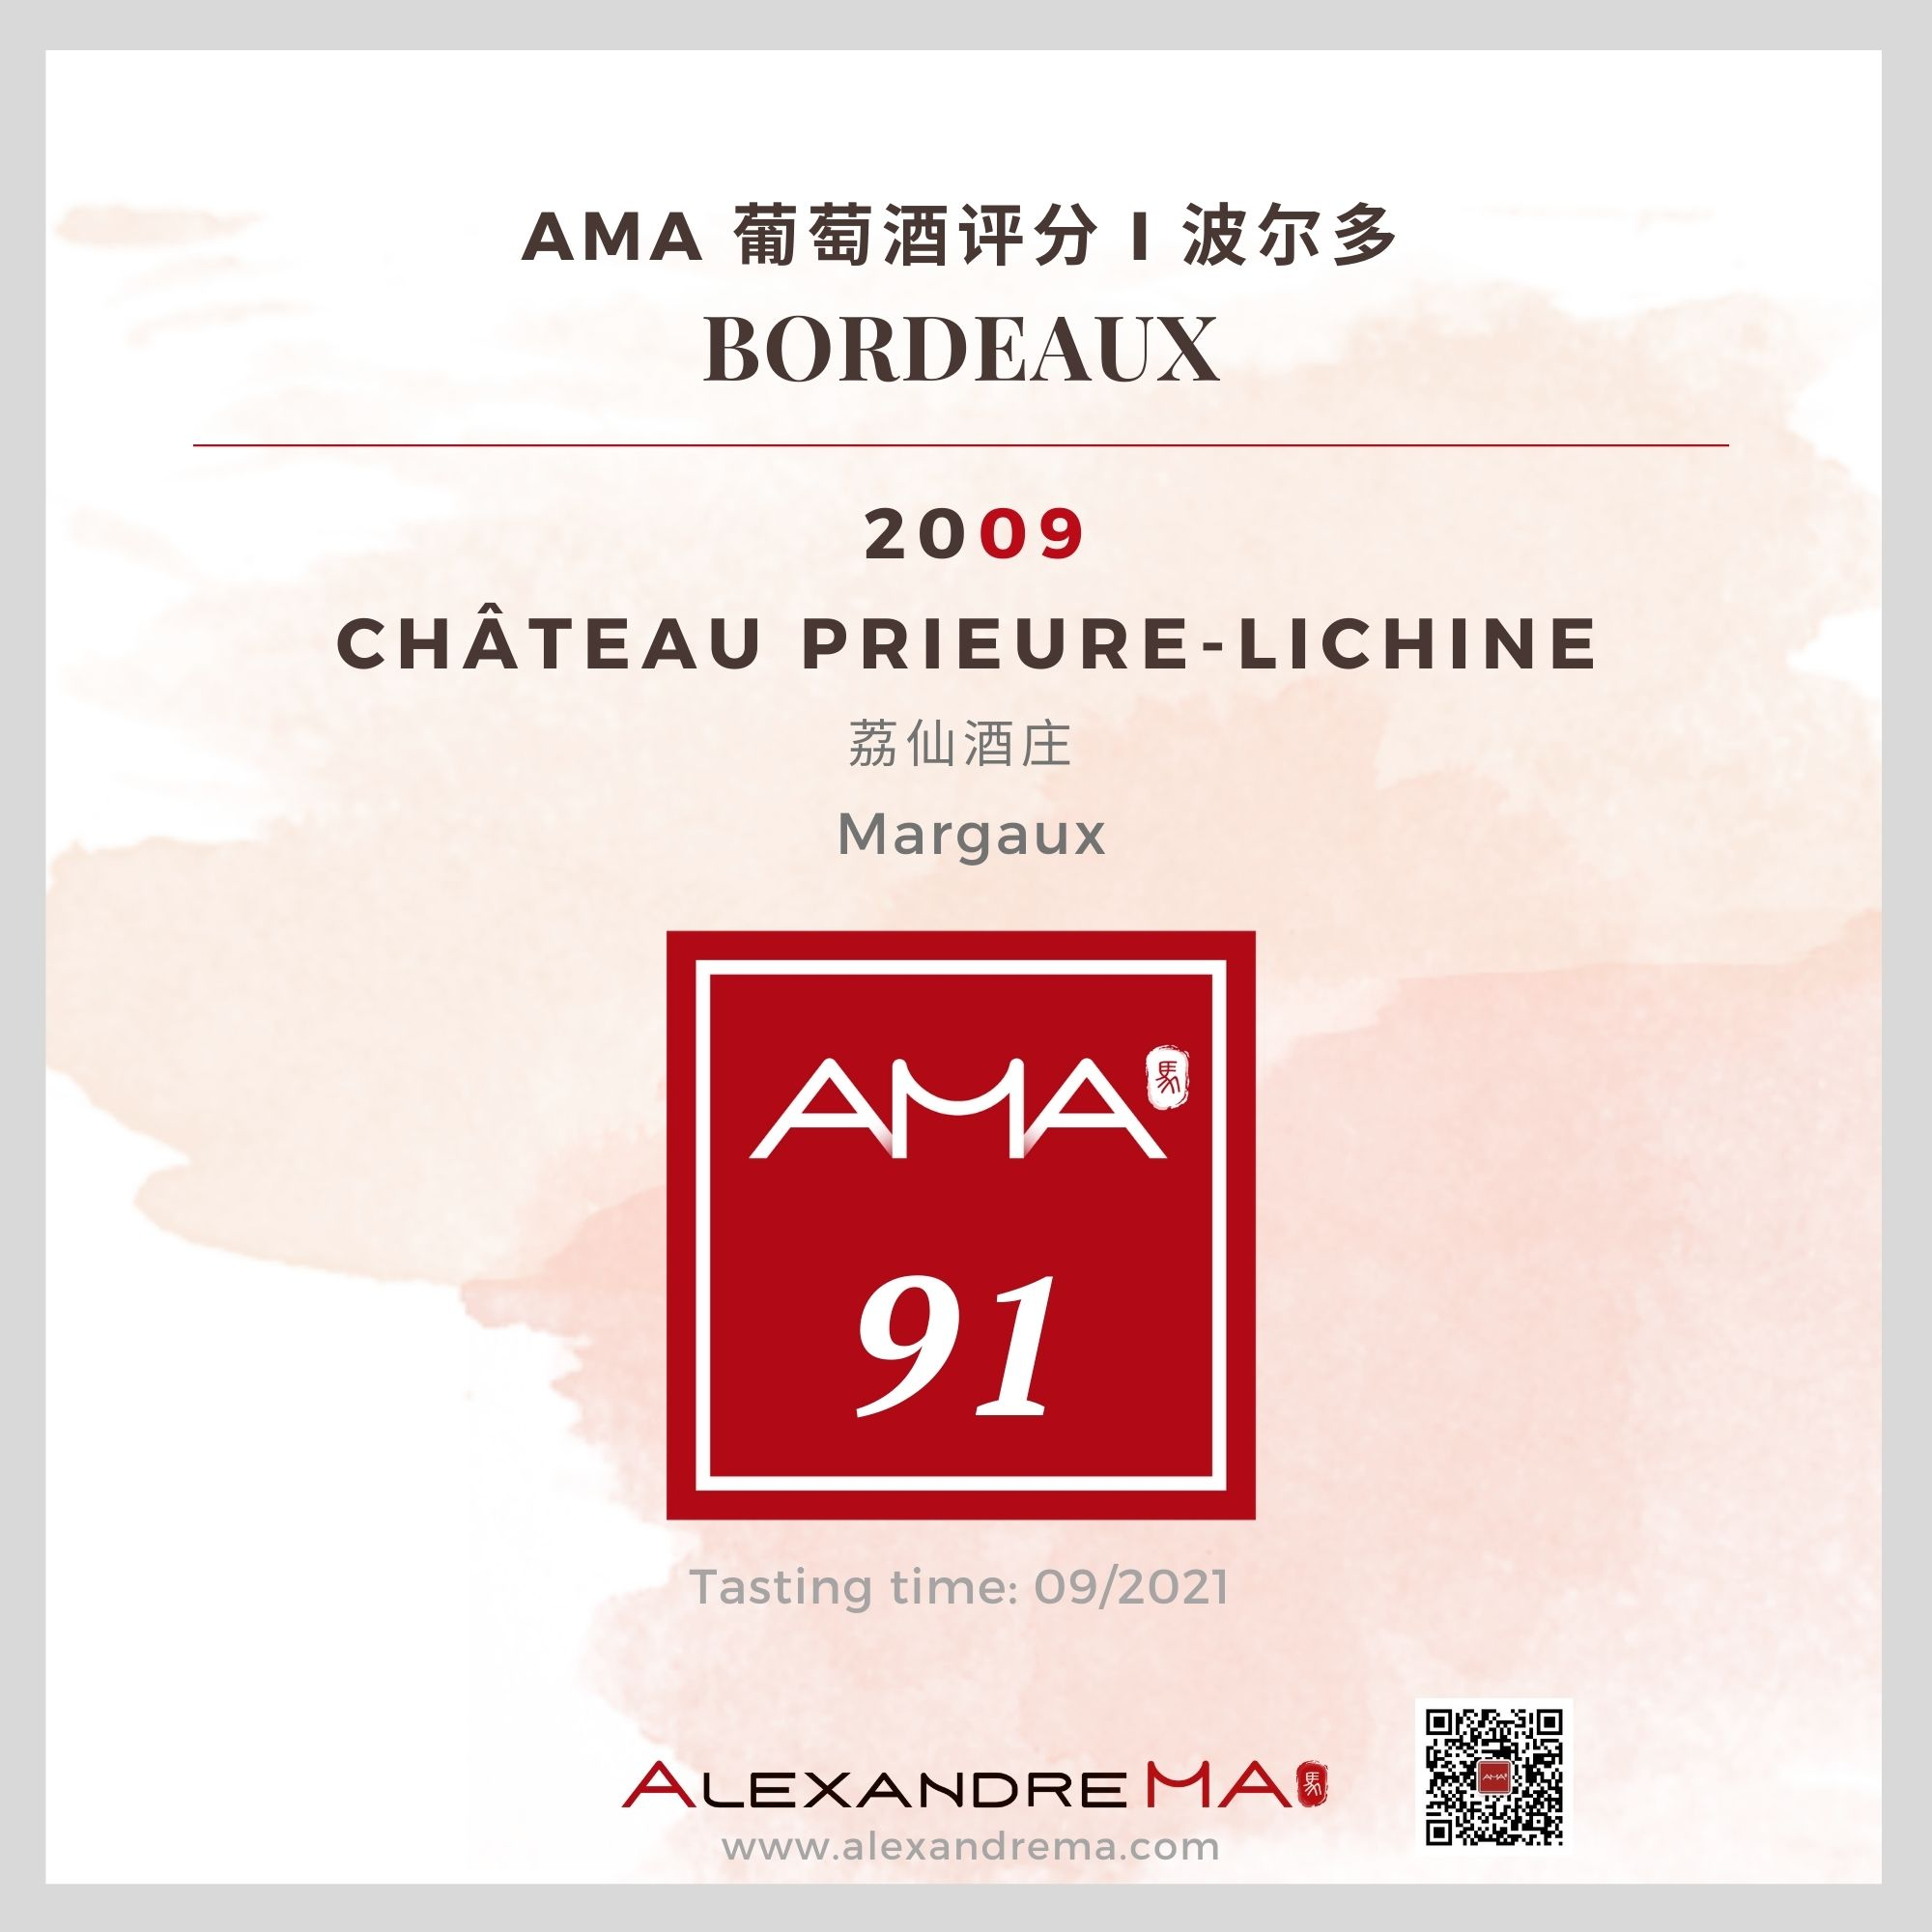 Château Prieuré-Lichine 2009 - Alexandre MA